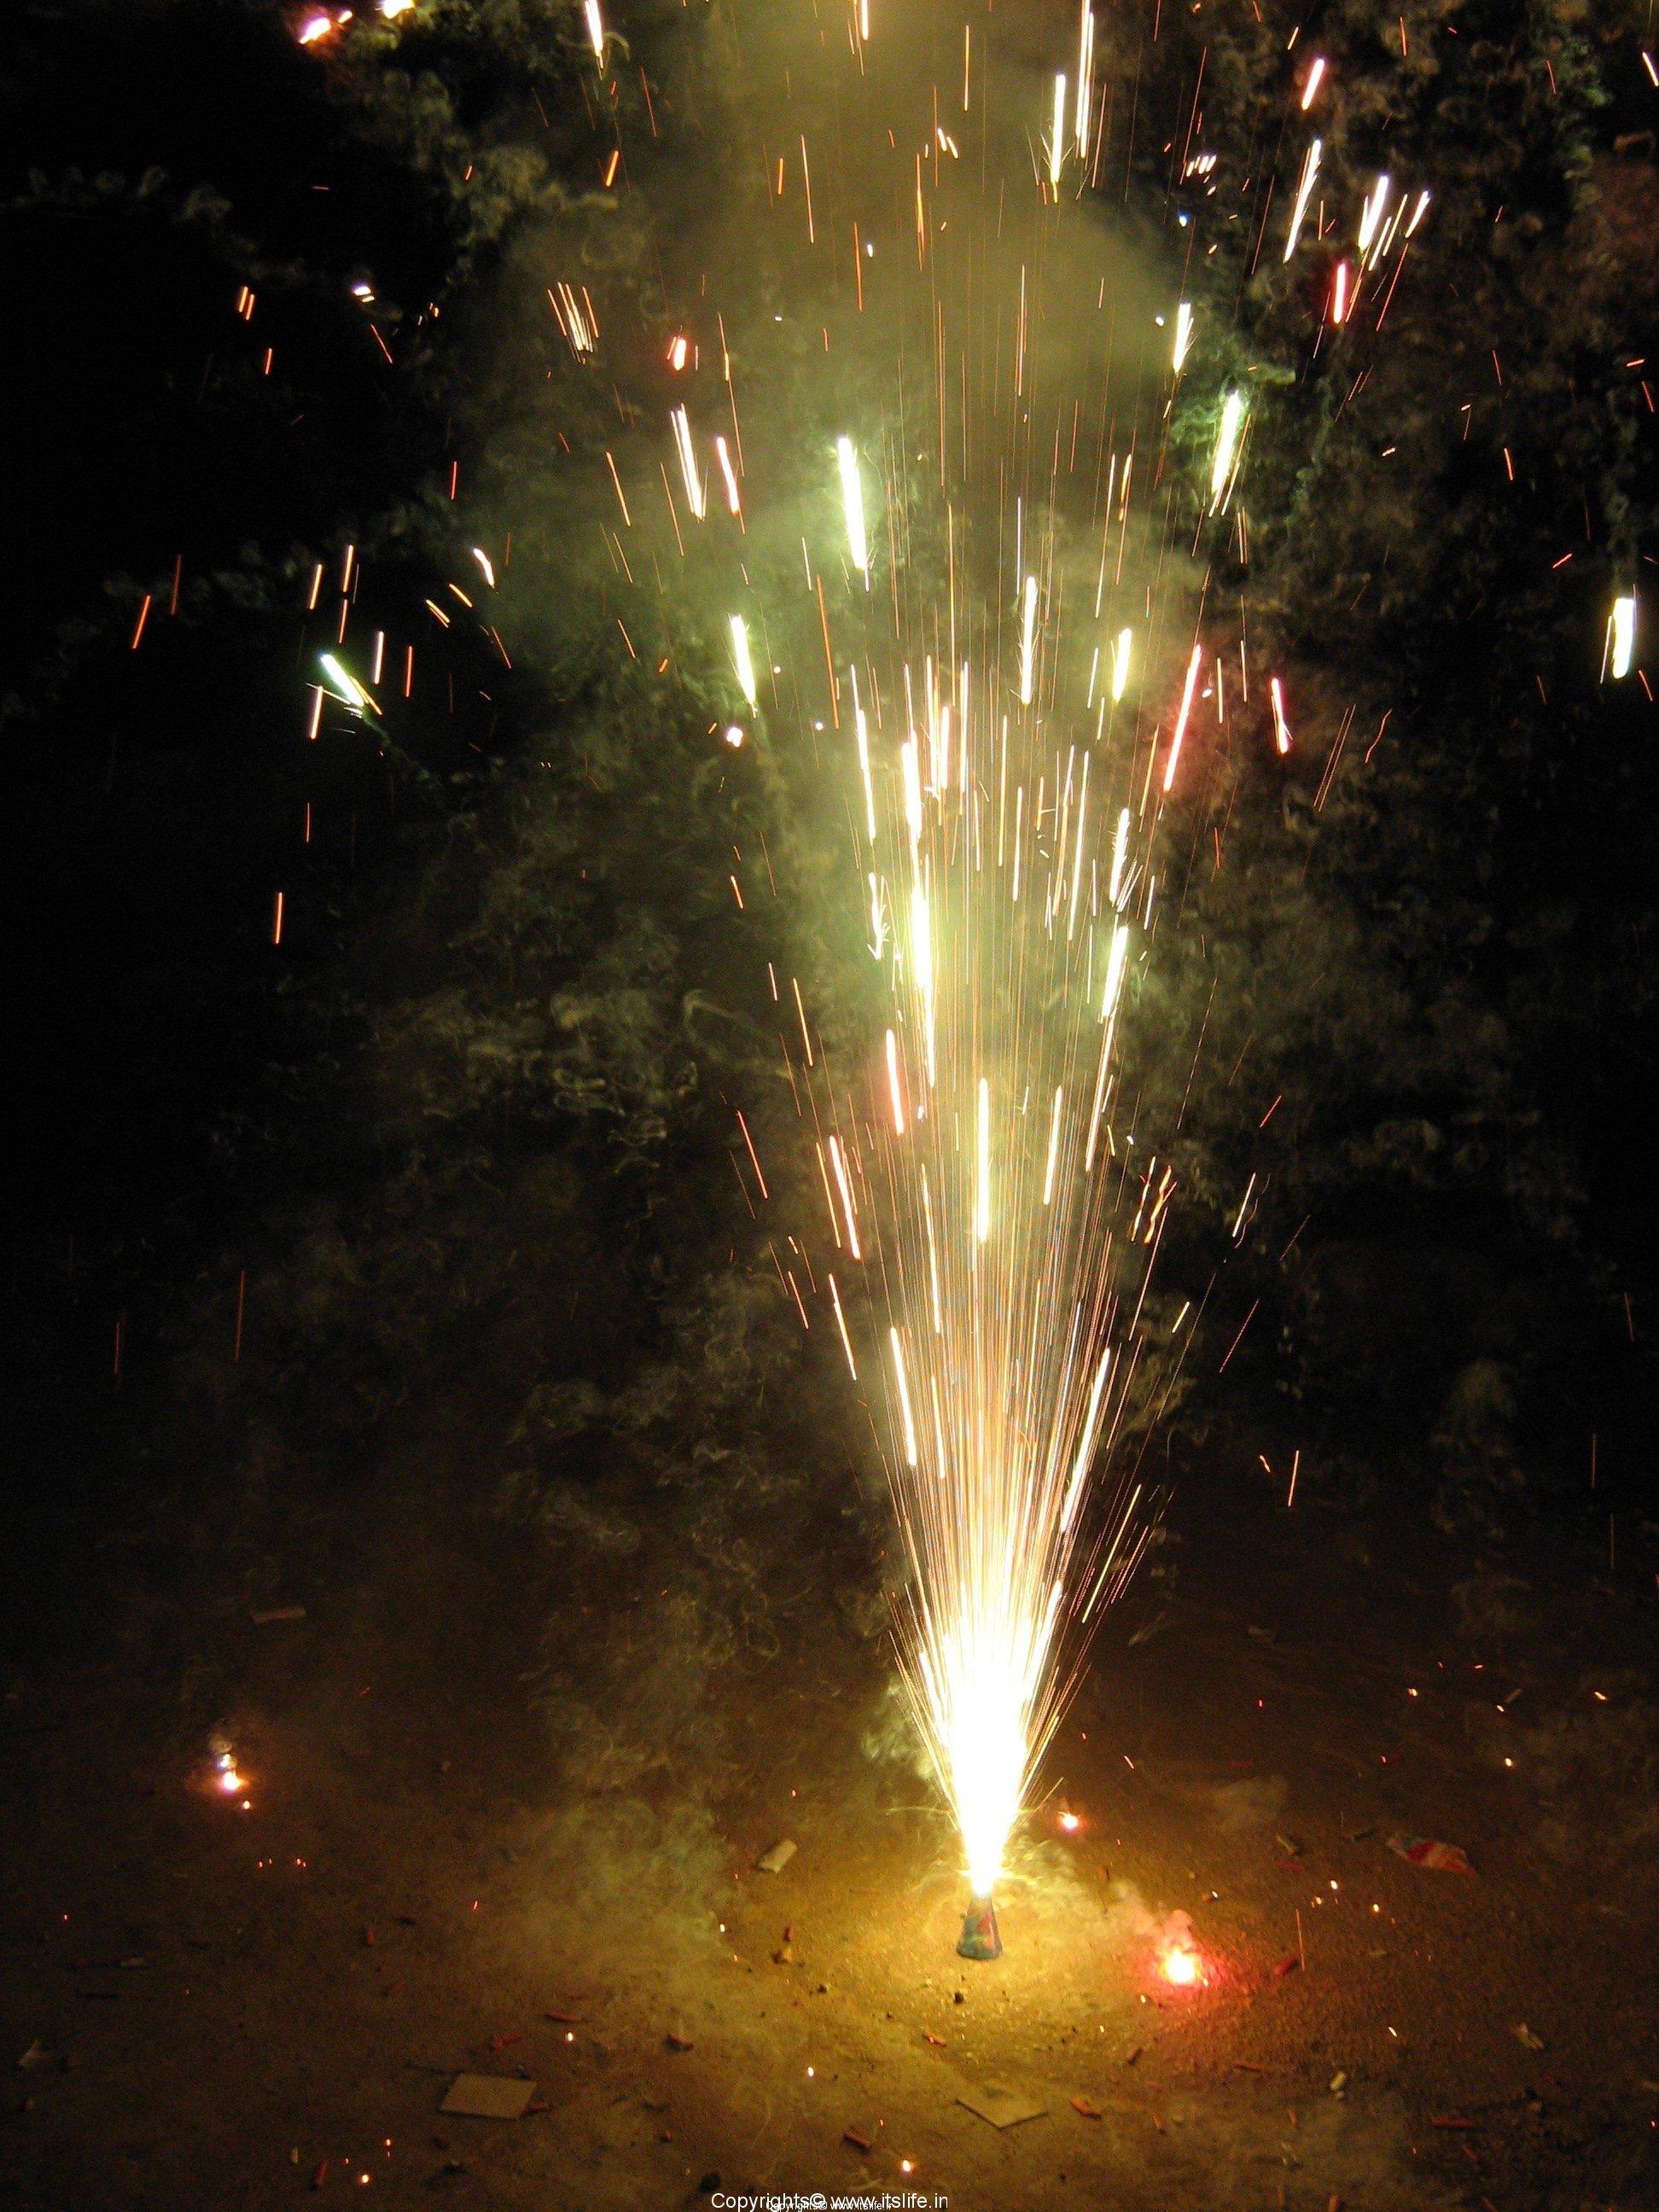 024 Deepavali Festival Essay In Tamil Example Diwali Unbelievable Christmas Language Full